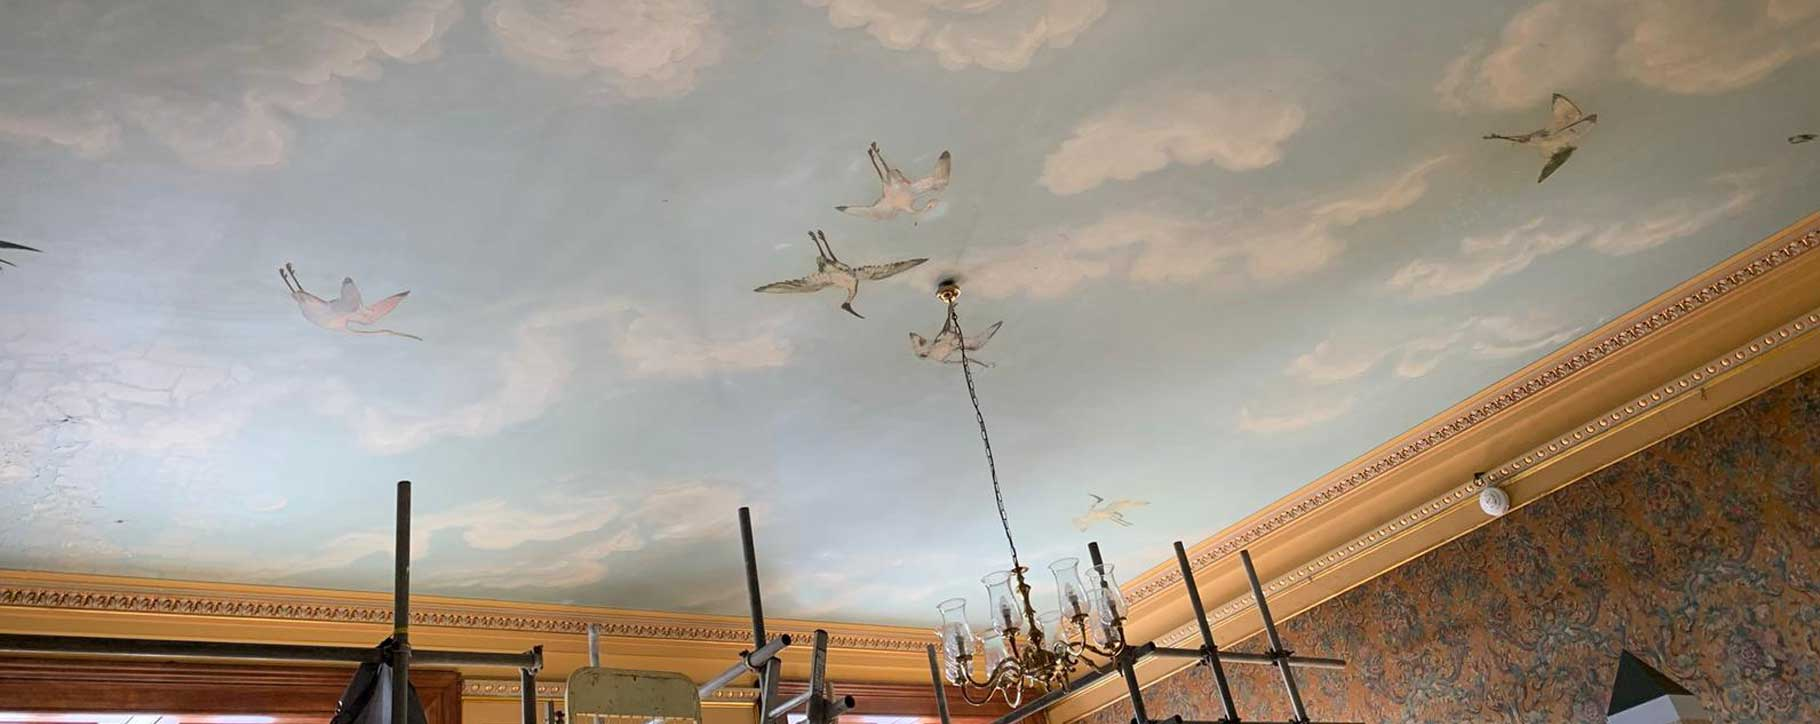 westonbirt school ceiling before restoration